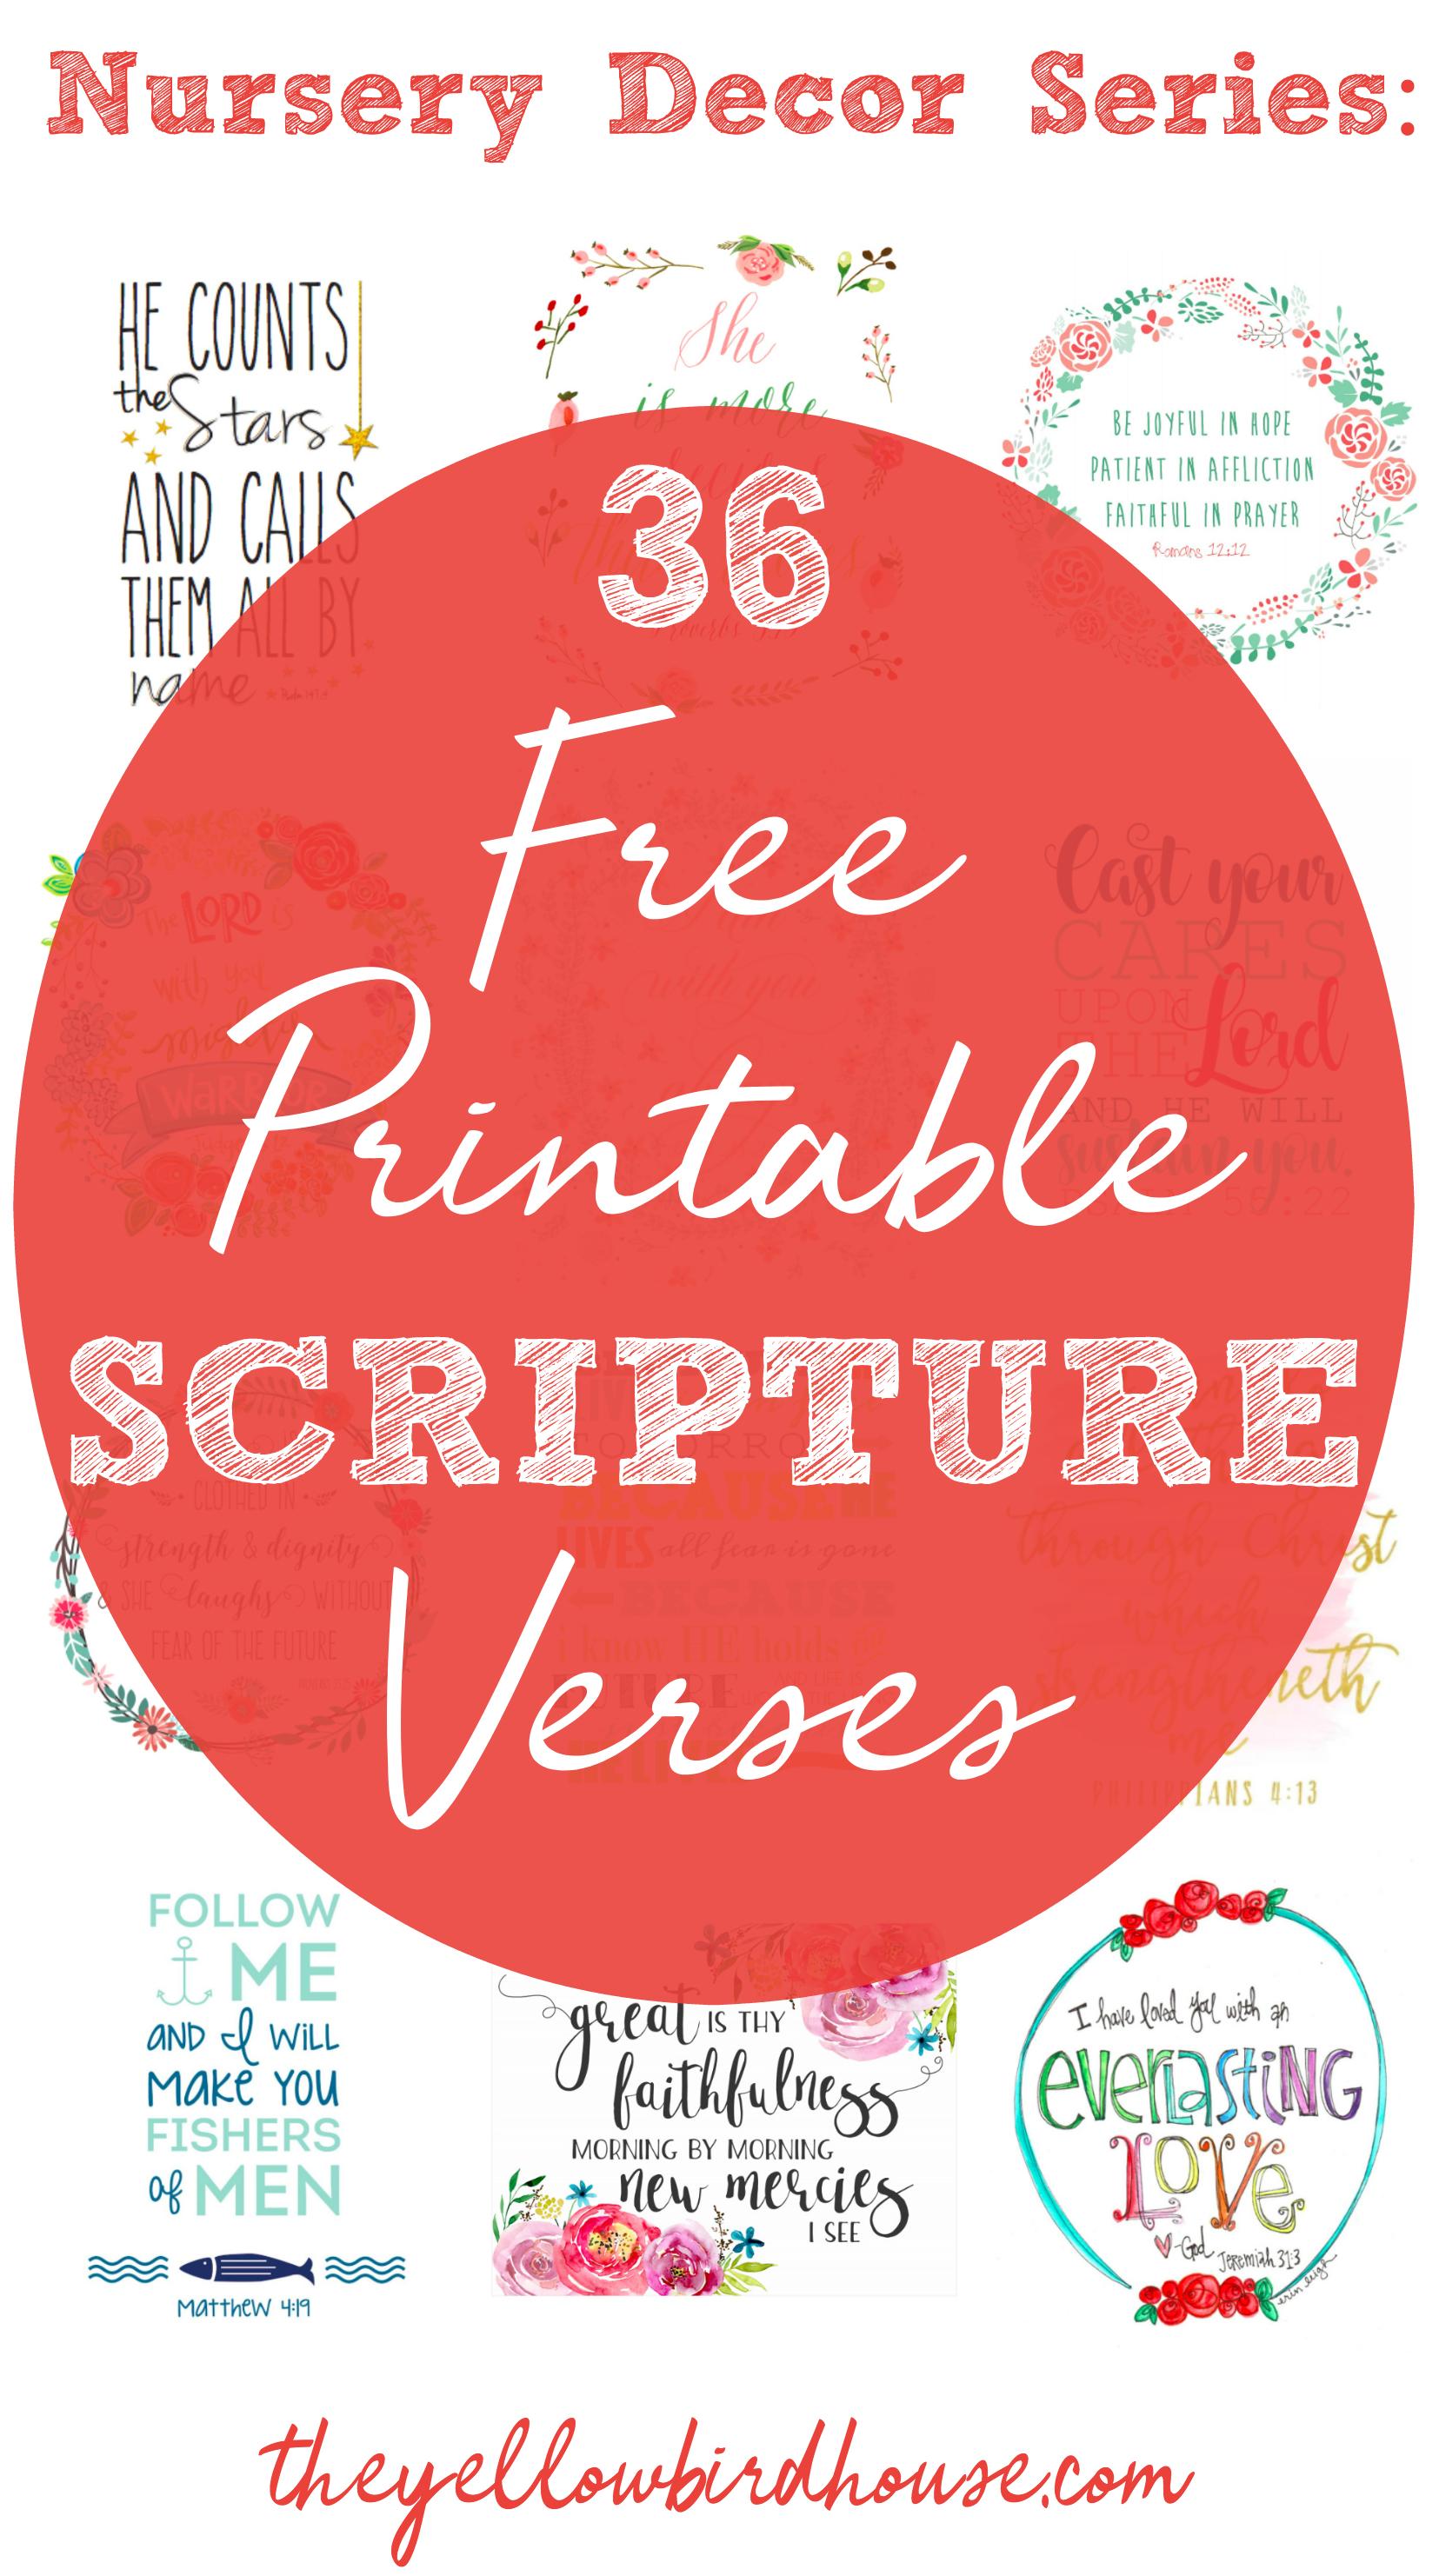 Nursery Decor Series: 36 Free Printable Scripture Verses - Free Printable Scripture Verses